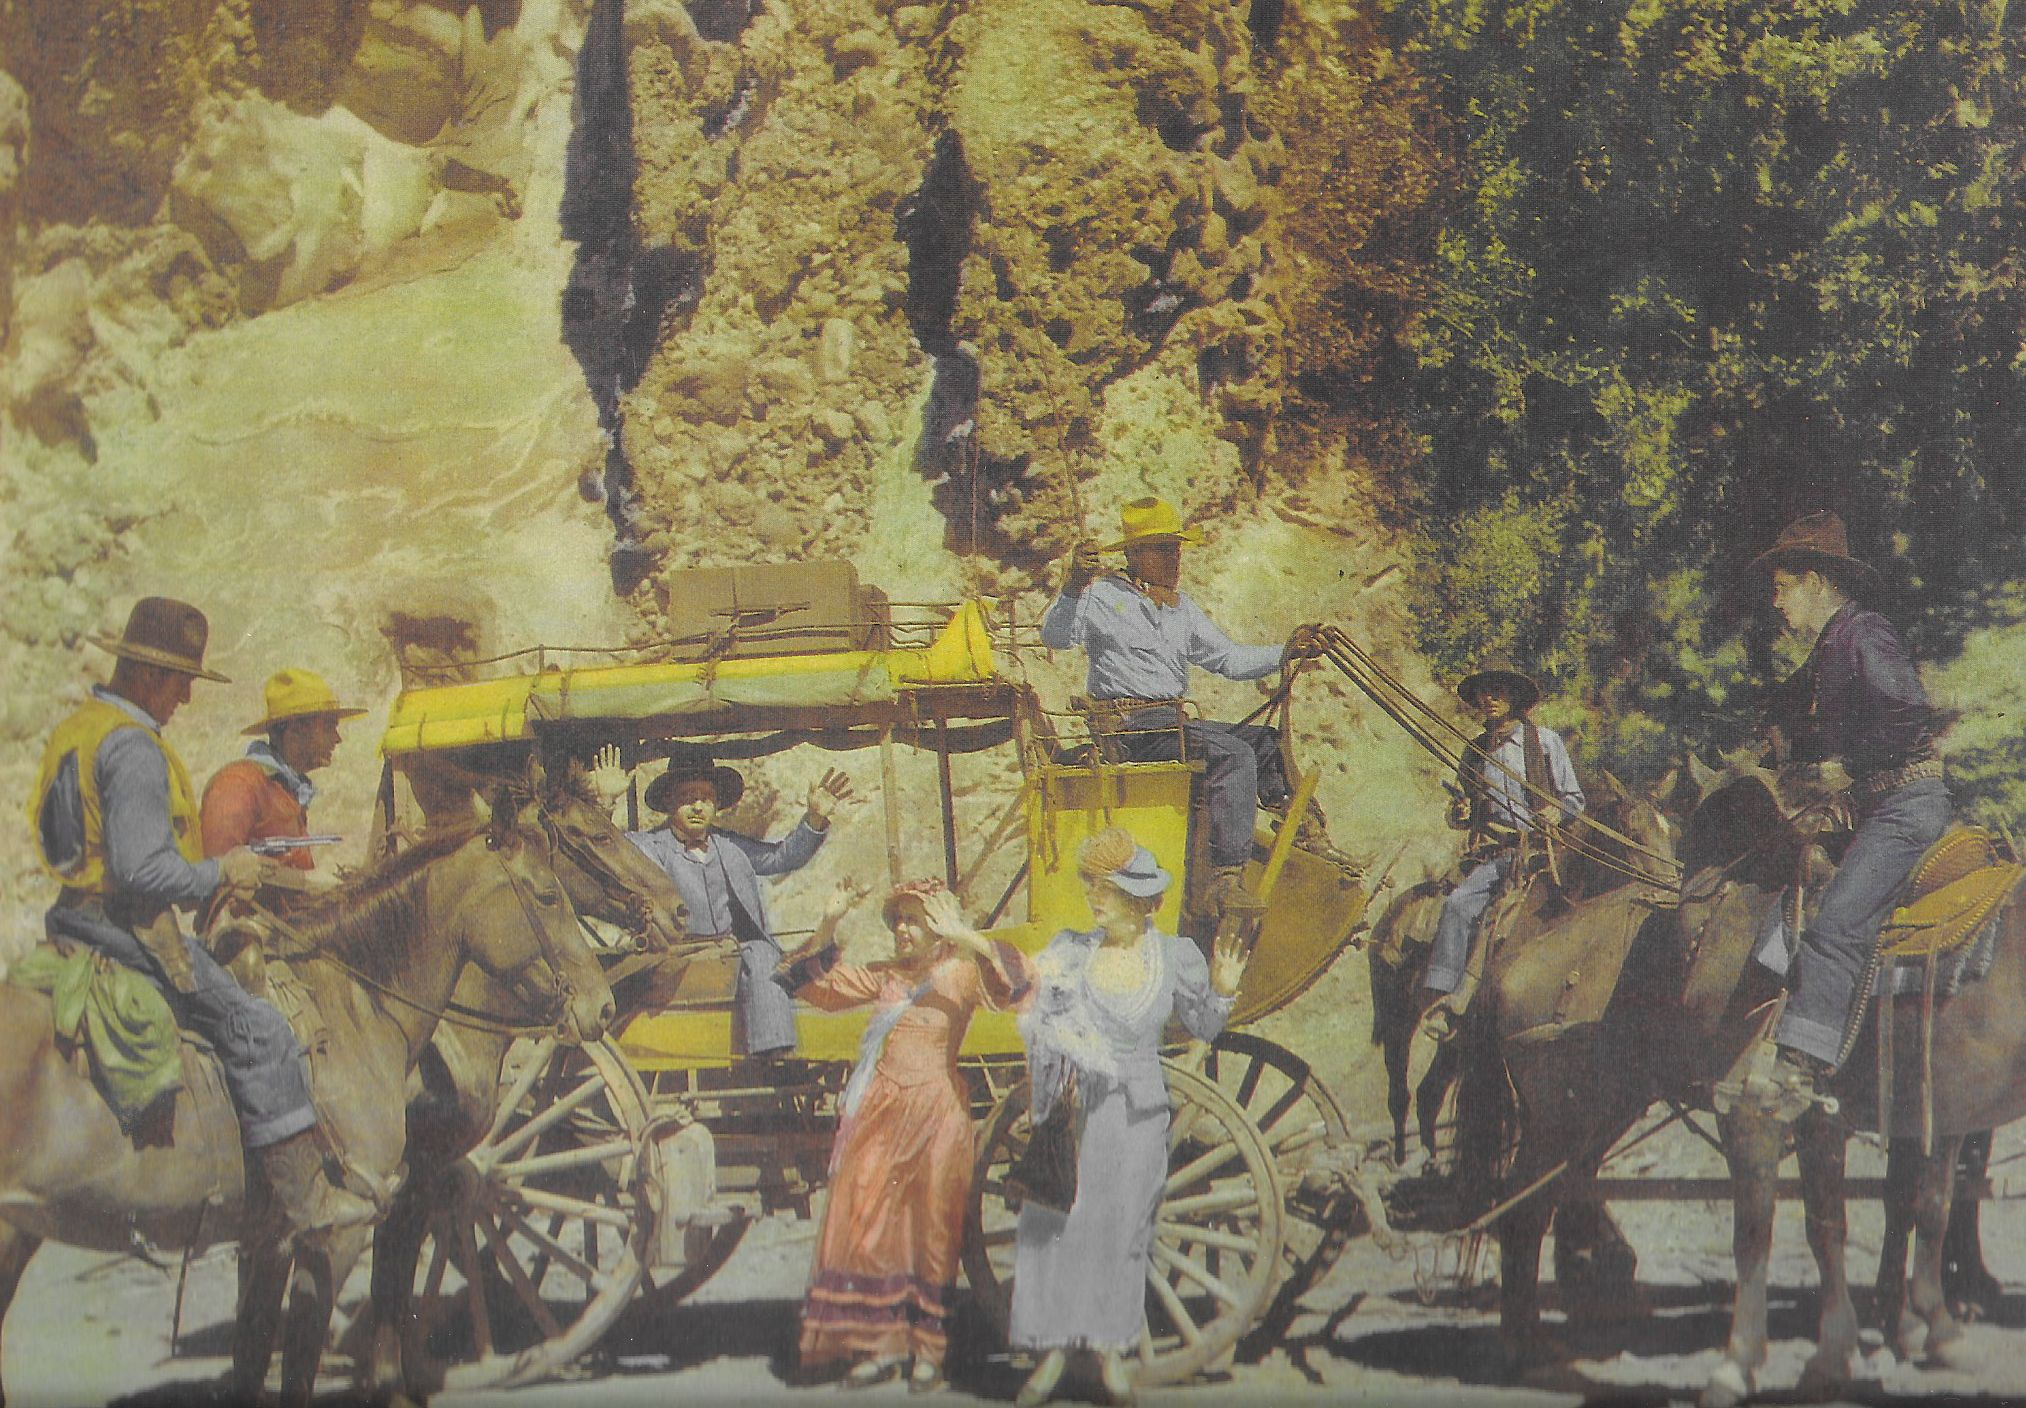 Ed Brady, Dorothy Dix, George 'Gabby' Hayes, Artie Ortego, and Bob Steele in The Nevada Buckaroo (1931)